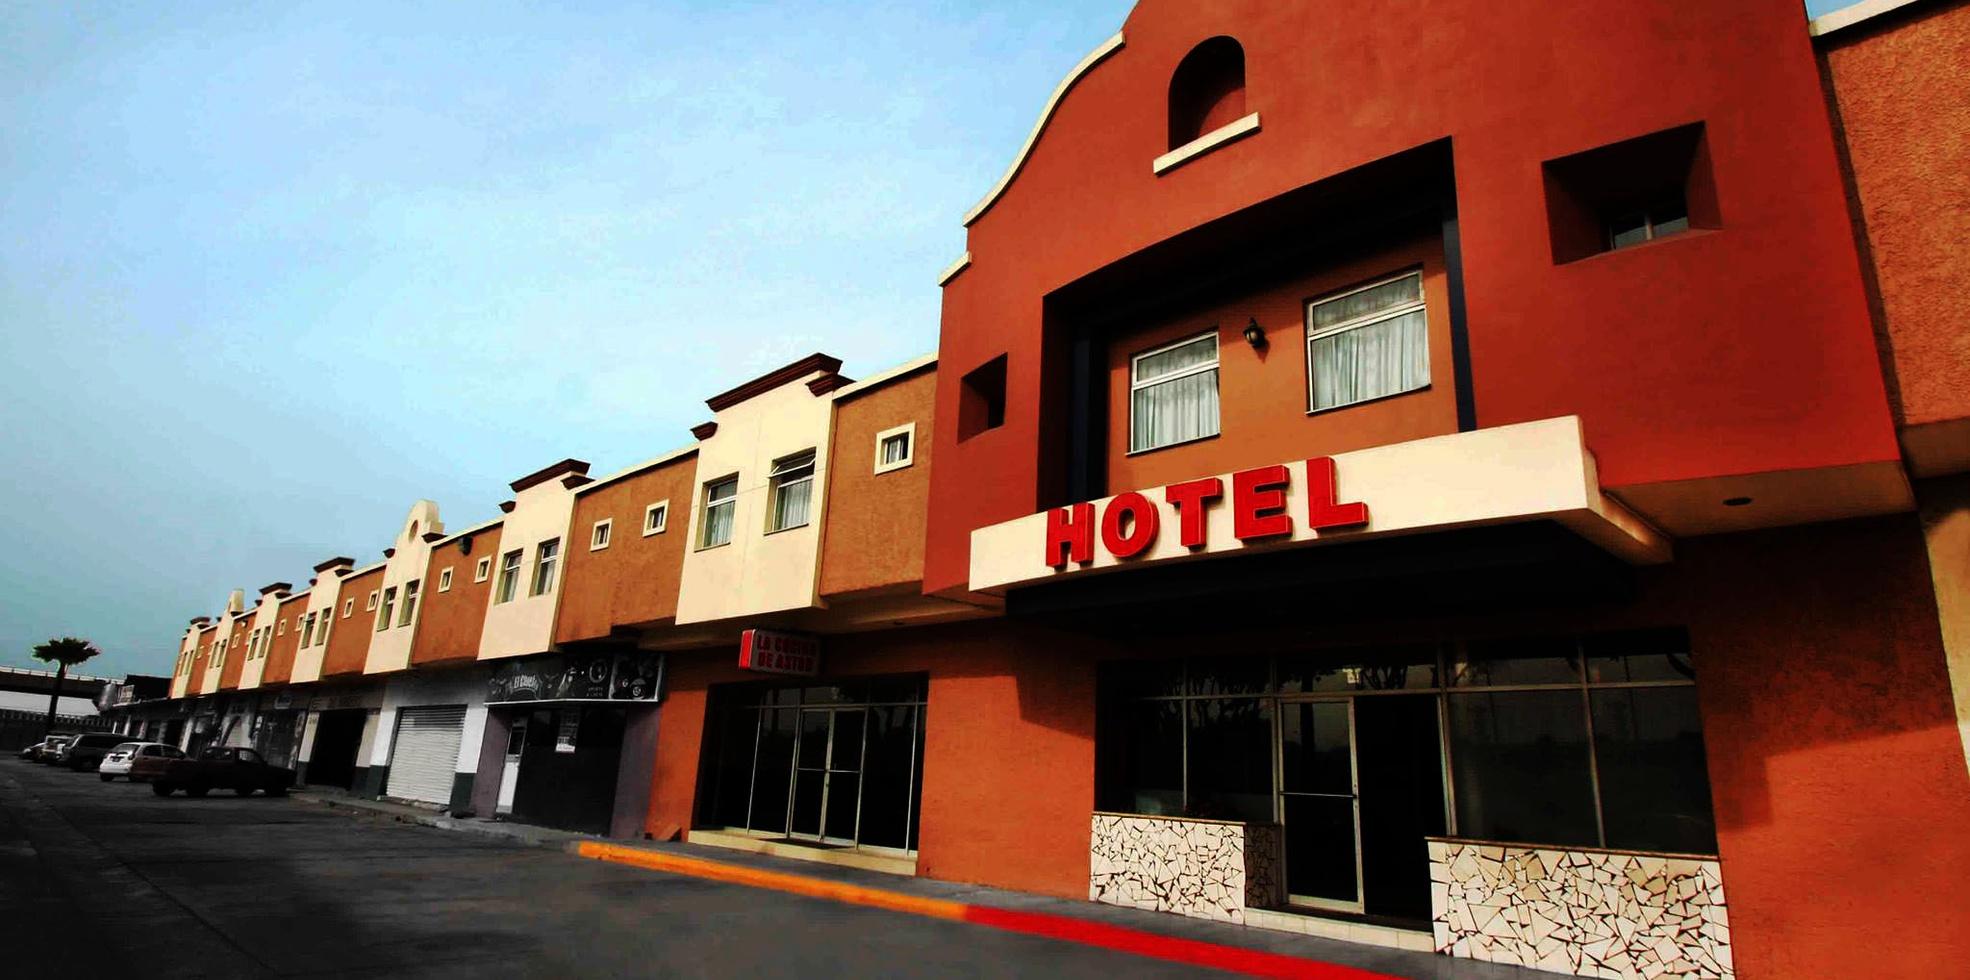 hotel astor en tijuana web oficial rh hotelastortijuana com